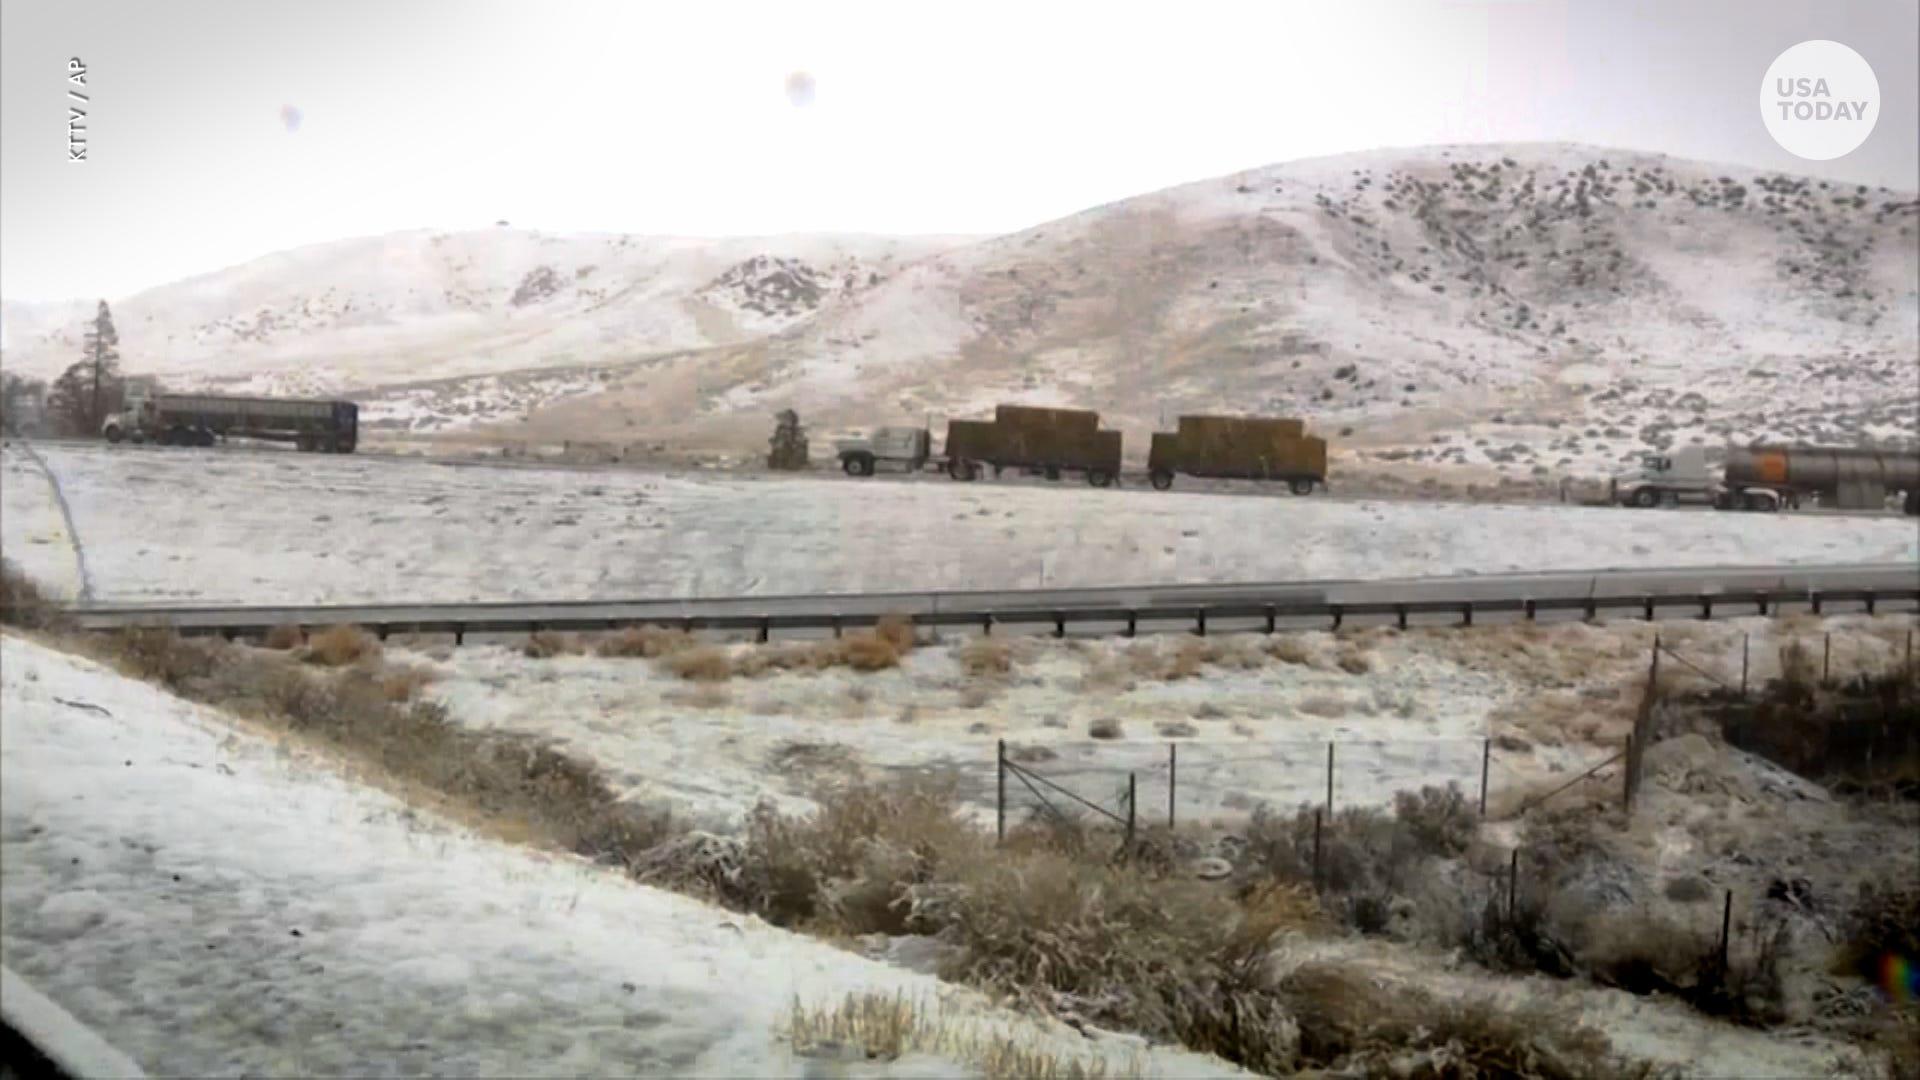 California Braces For Ice Floodudslides